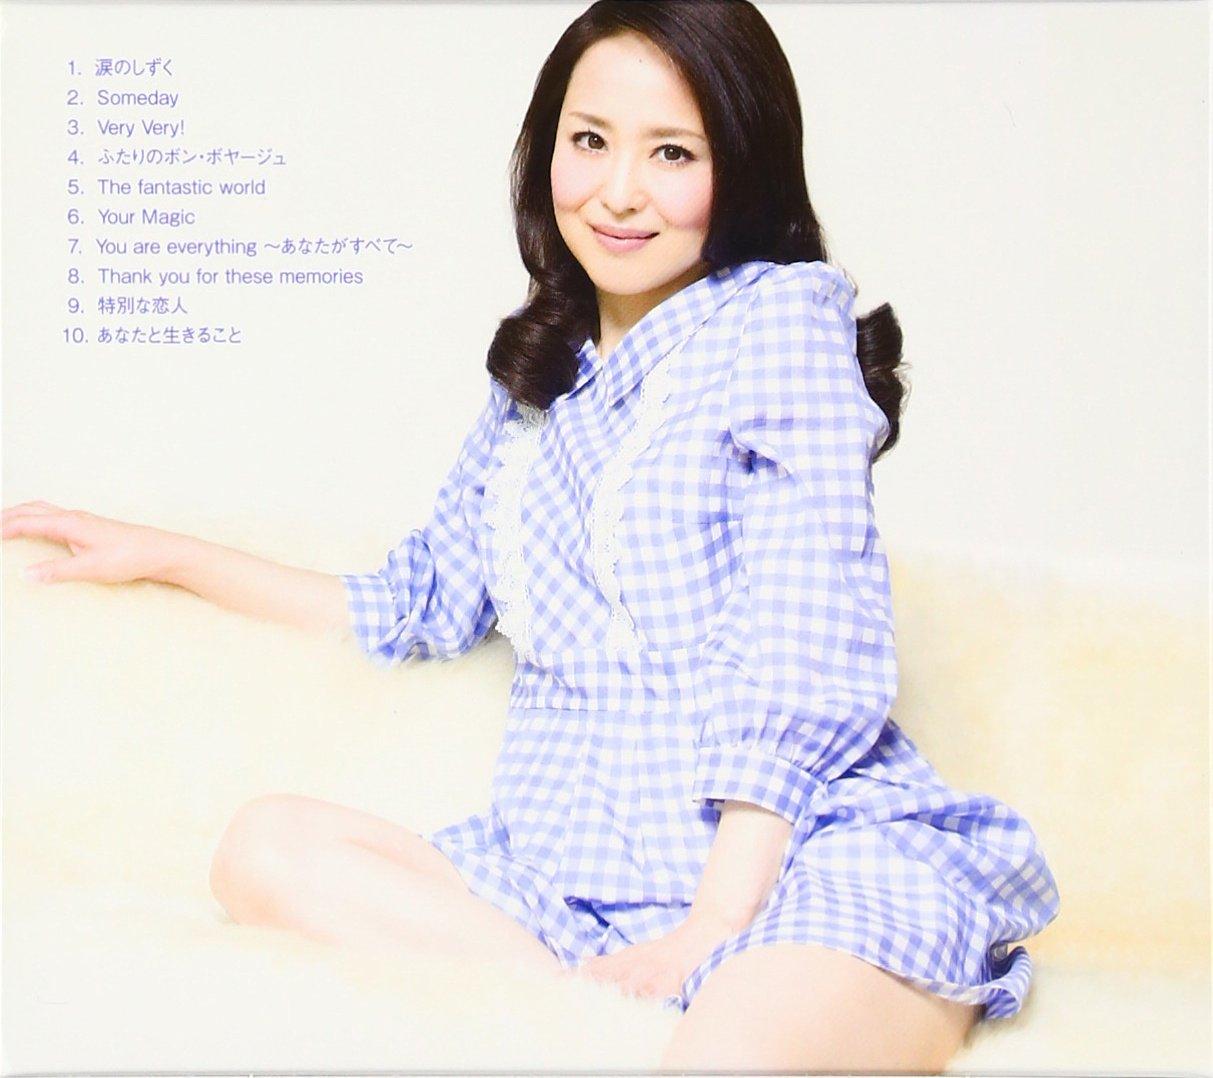 amazon very very 初回限定盤 松田聖子 seiko matsuda mariya